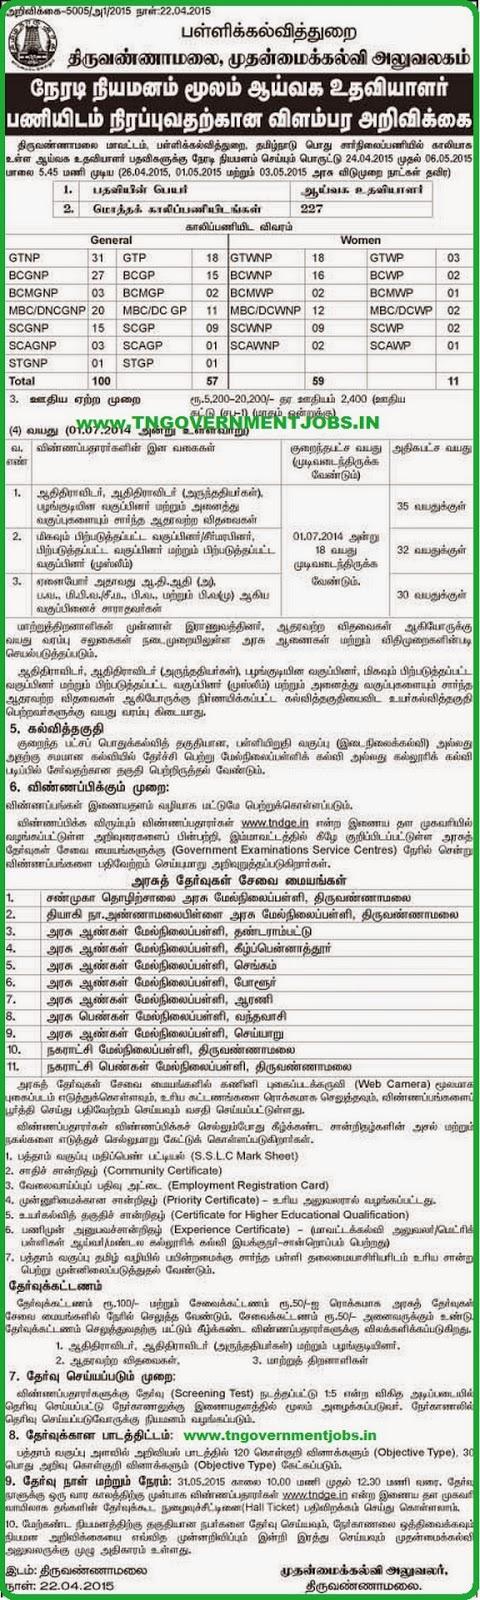 Thiruvannamalai District CEO Lab Asst Recruitments 2015 (www.tngovernmentjobs.in)